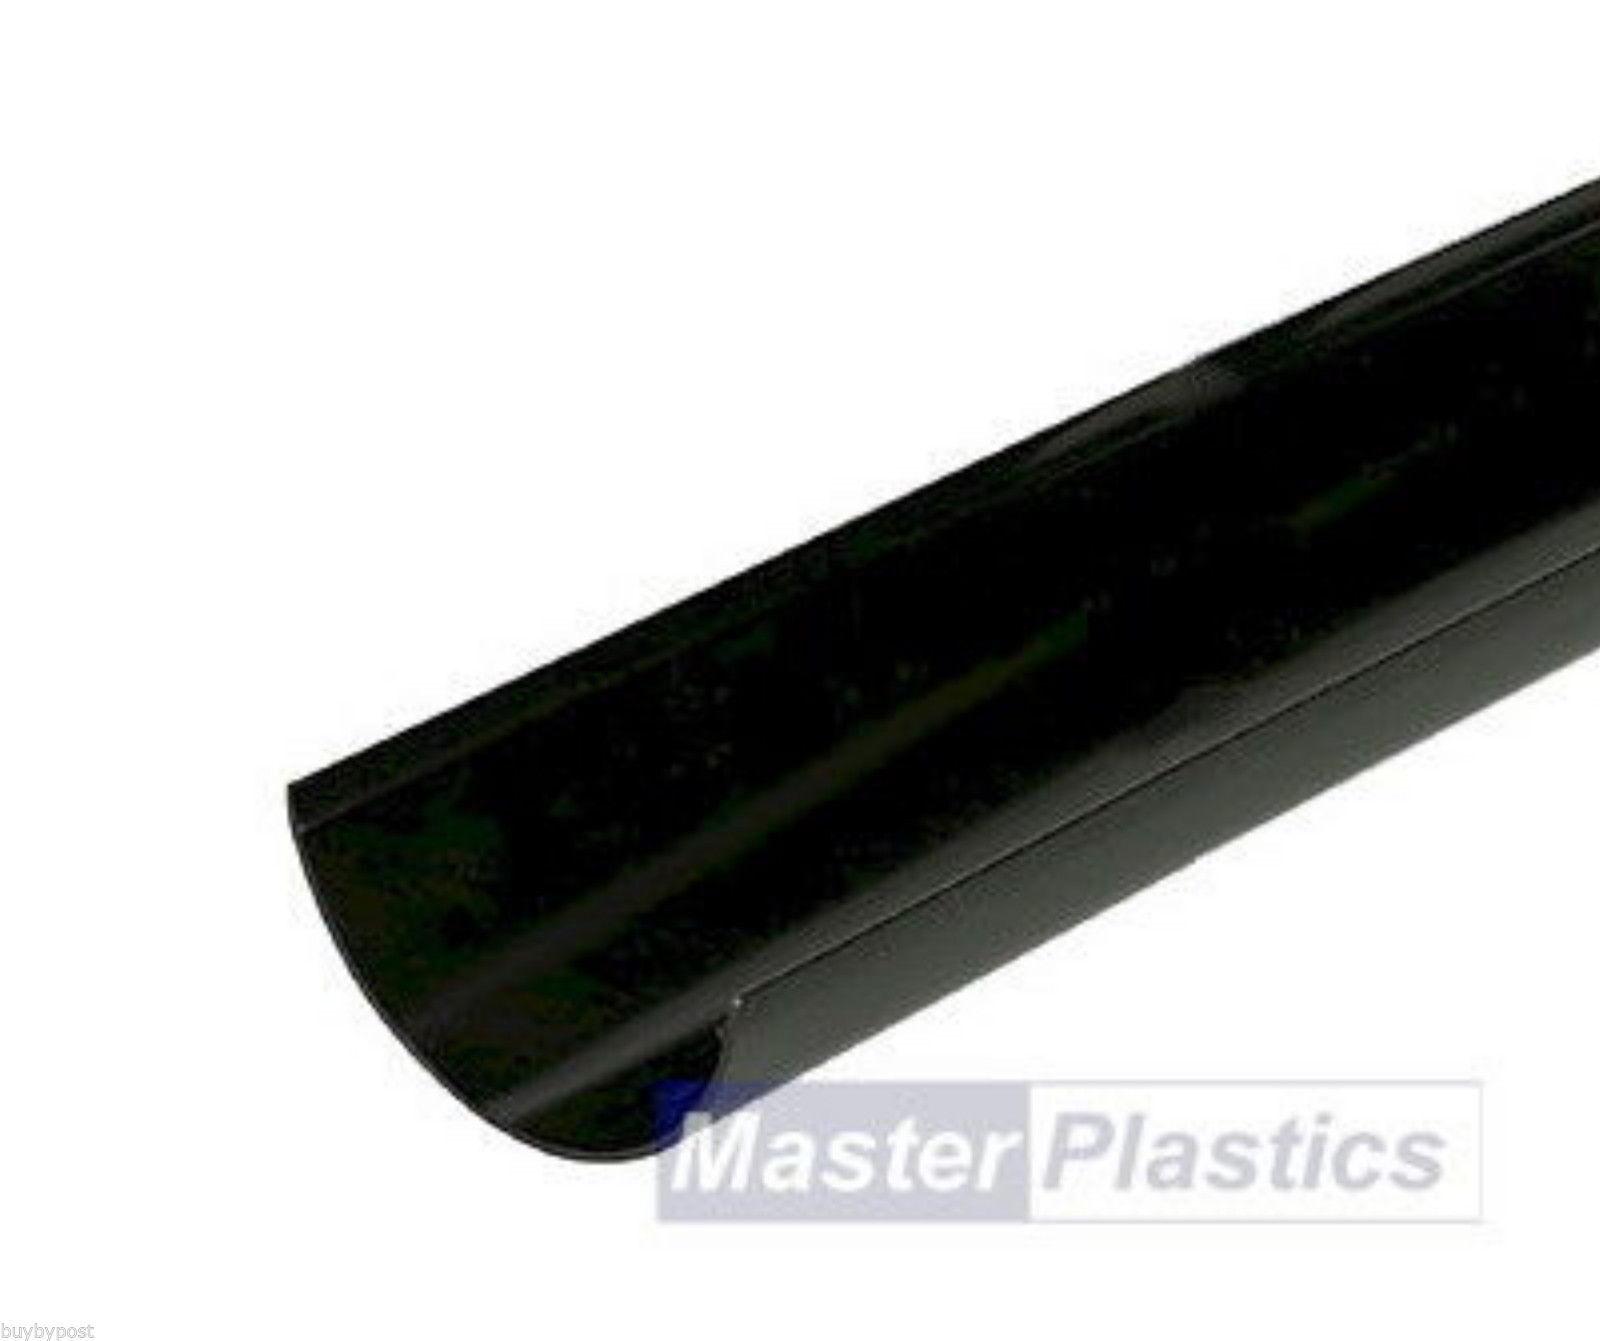 New Upvc Plastic Black Half Round Gutter And Guttering